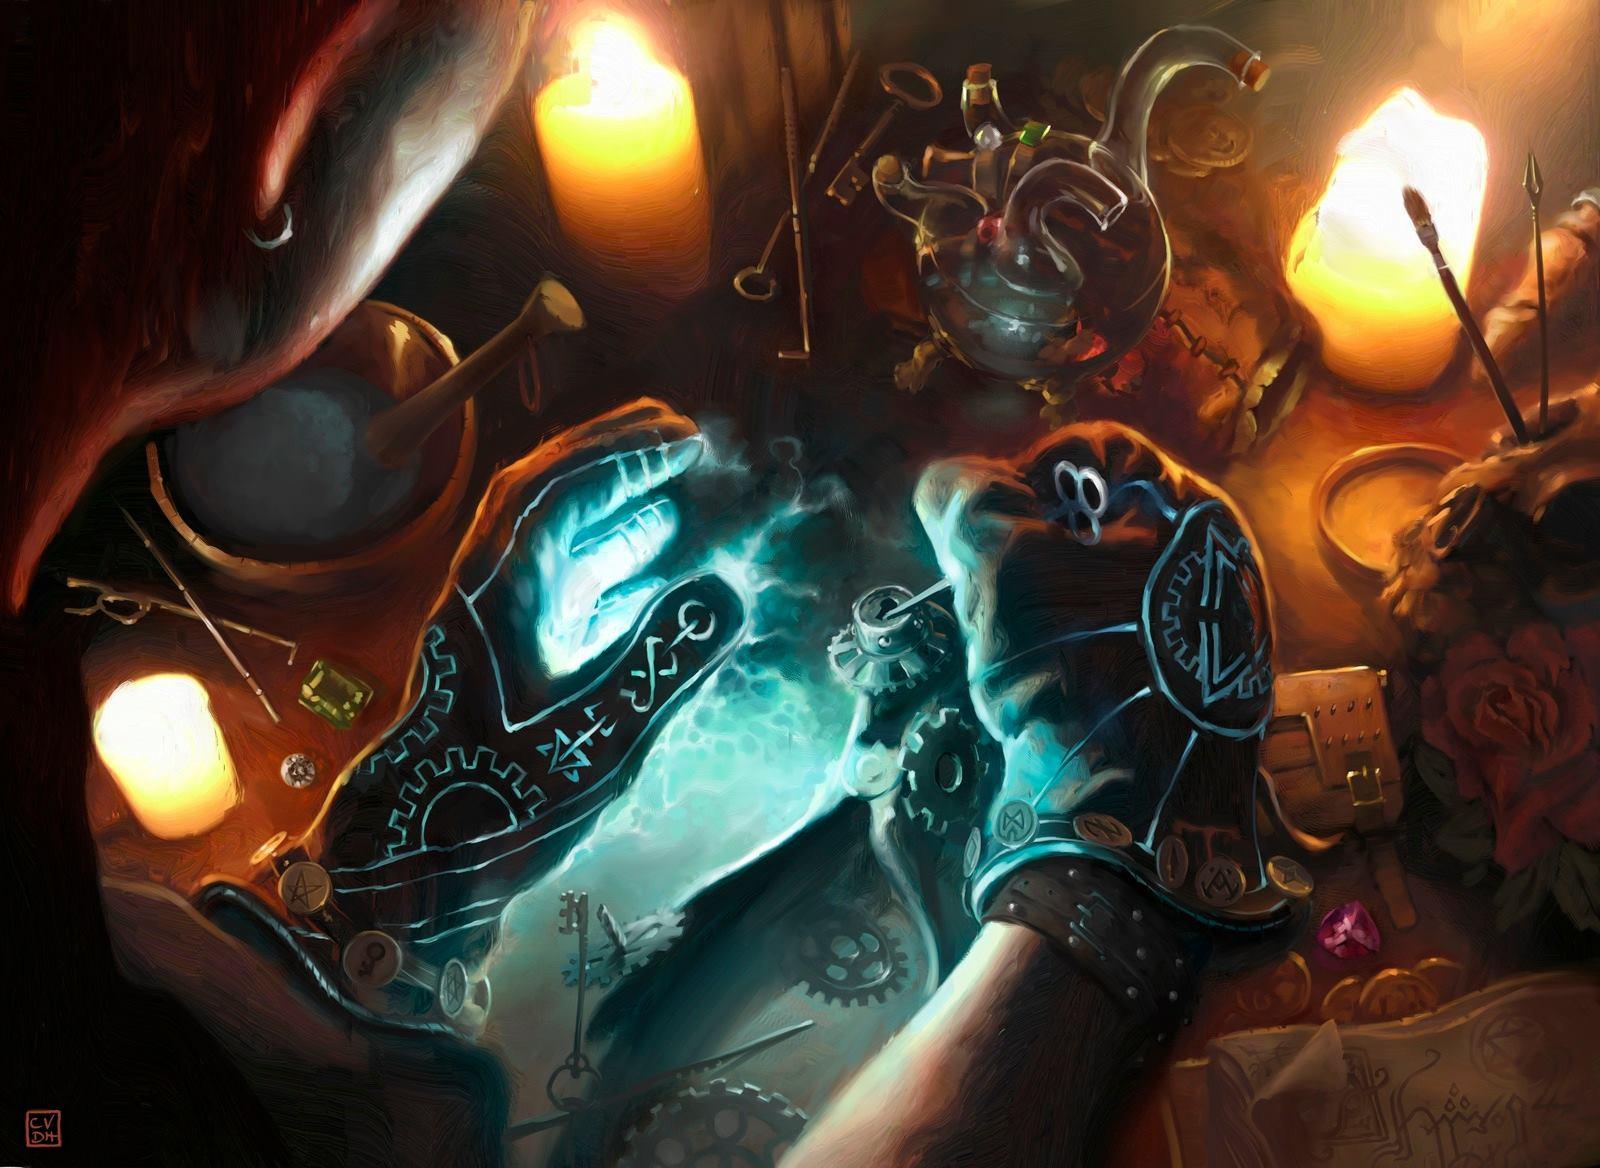 Rogue's Gloves MTG card with attach illustration. Image copyright: Wizards of the Coast. Artist: Cyril Van Der Haegen.